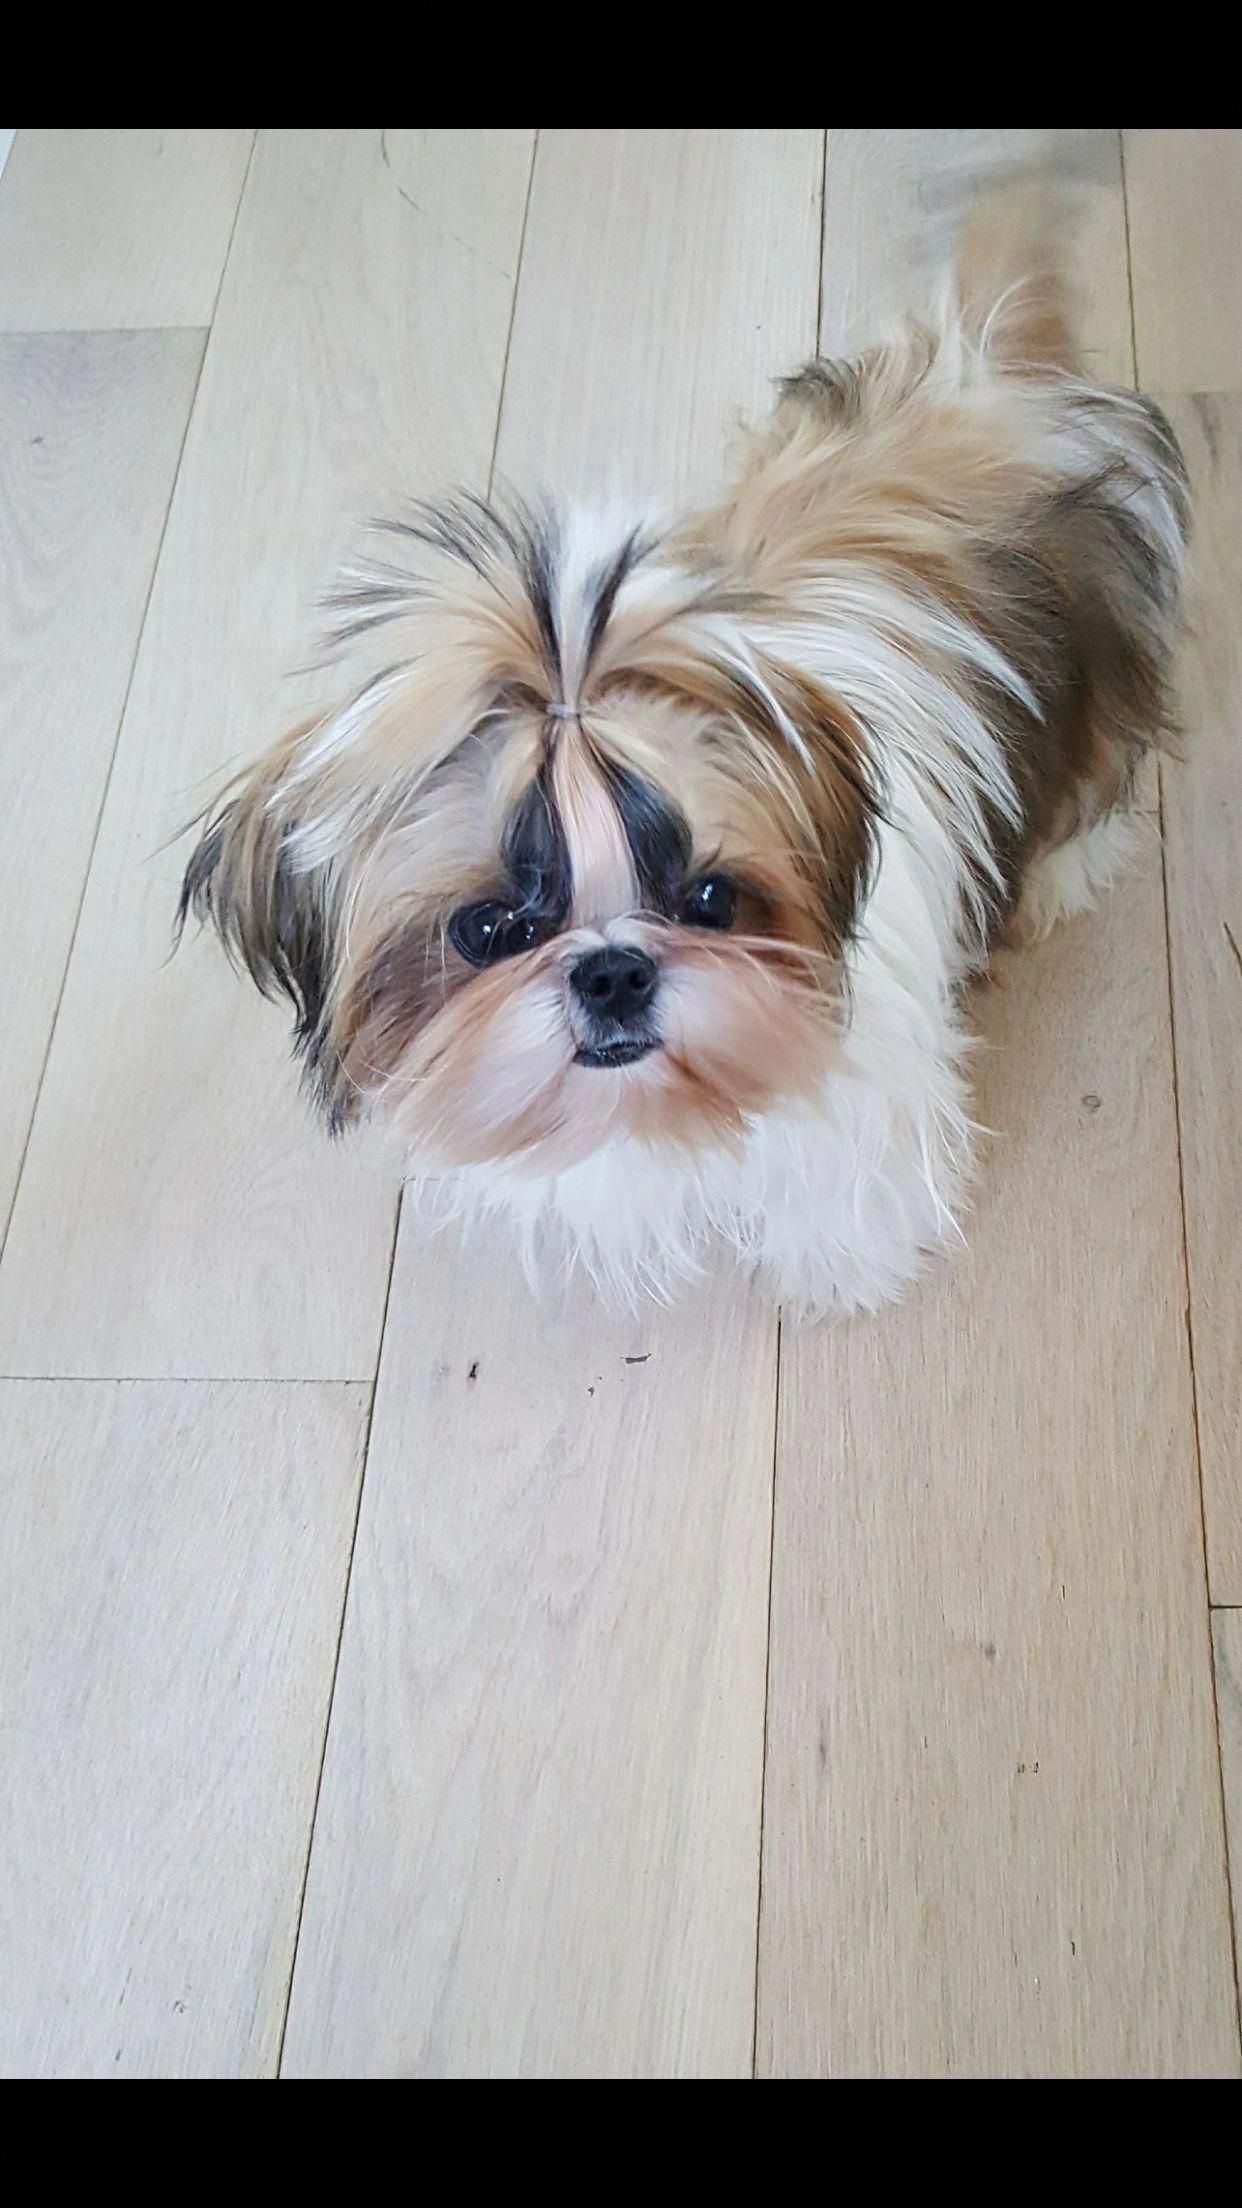 The Many Things We Like About The Playfull Shih Tzu Shihtzumix Shitzuinstagram Shih Tzu Dog Shih Tzu Shih Tzu Puppy